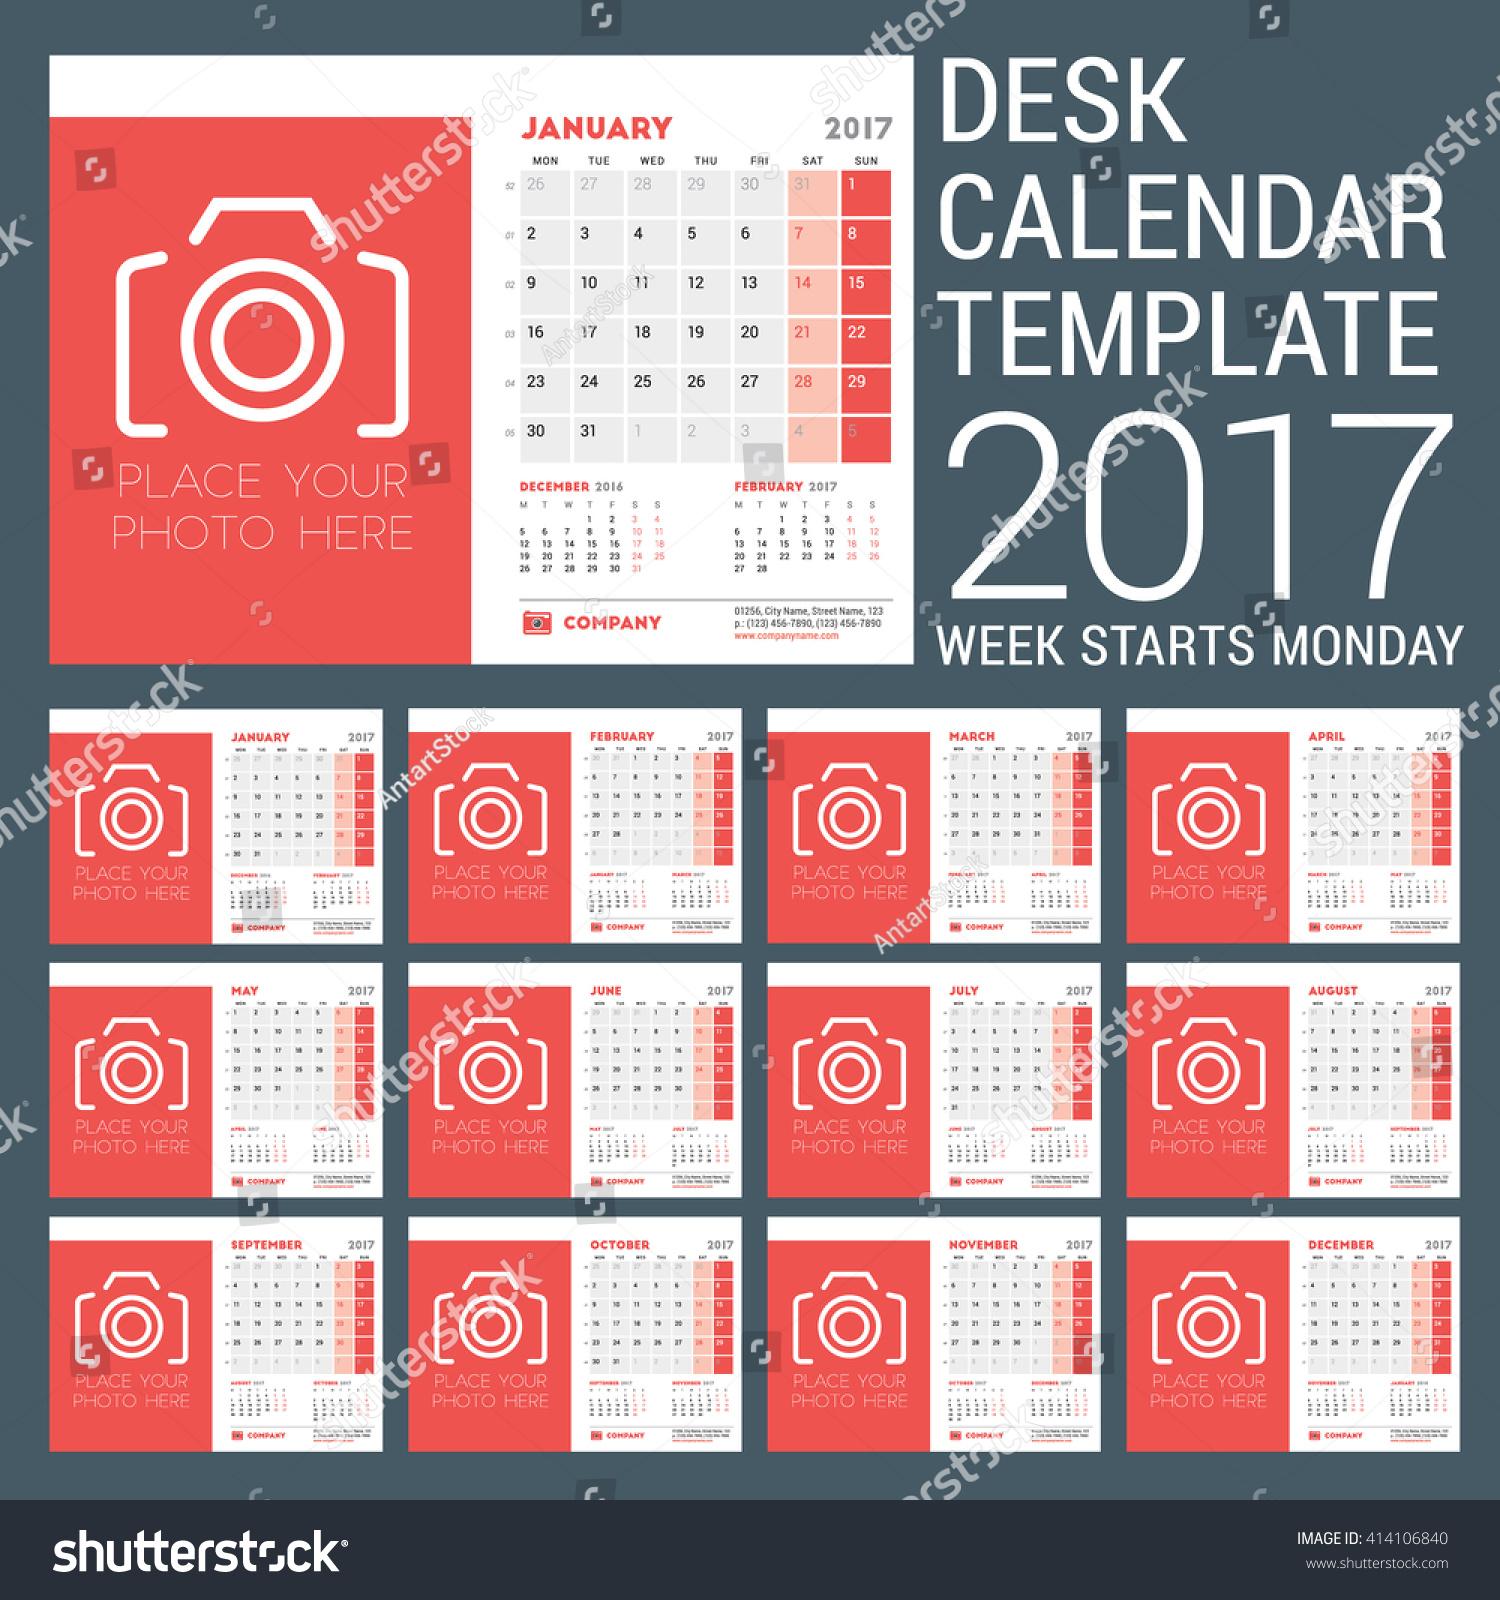 Calendar Typography Vector : Desk calendar template year stock vector